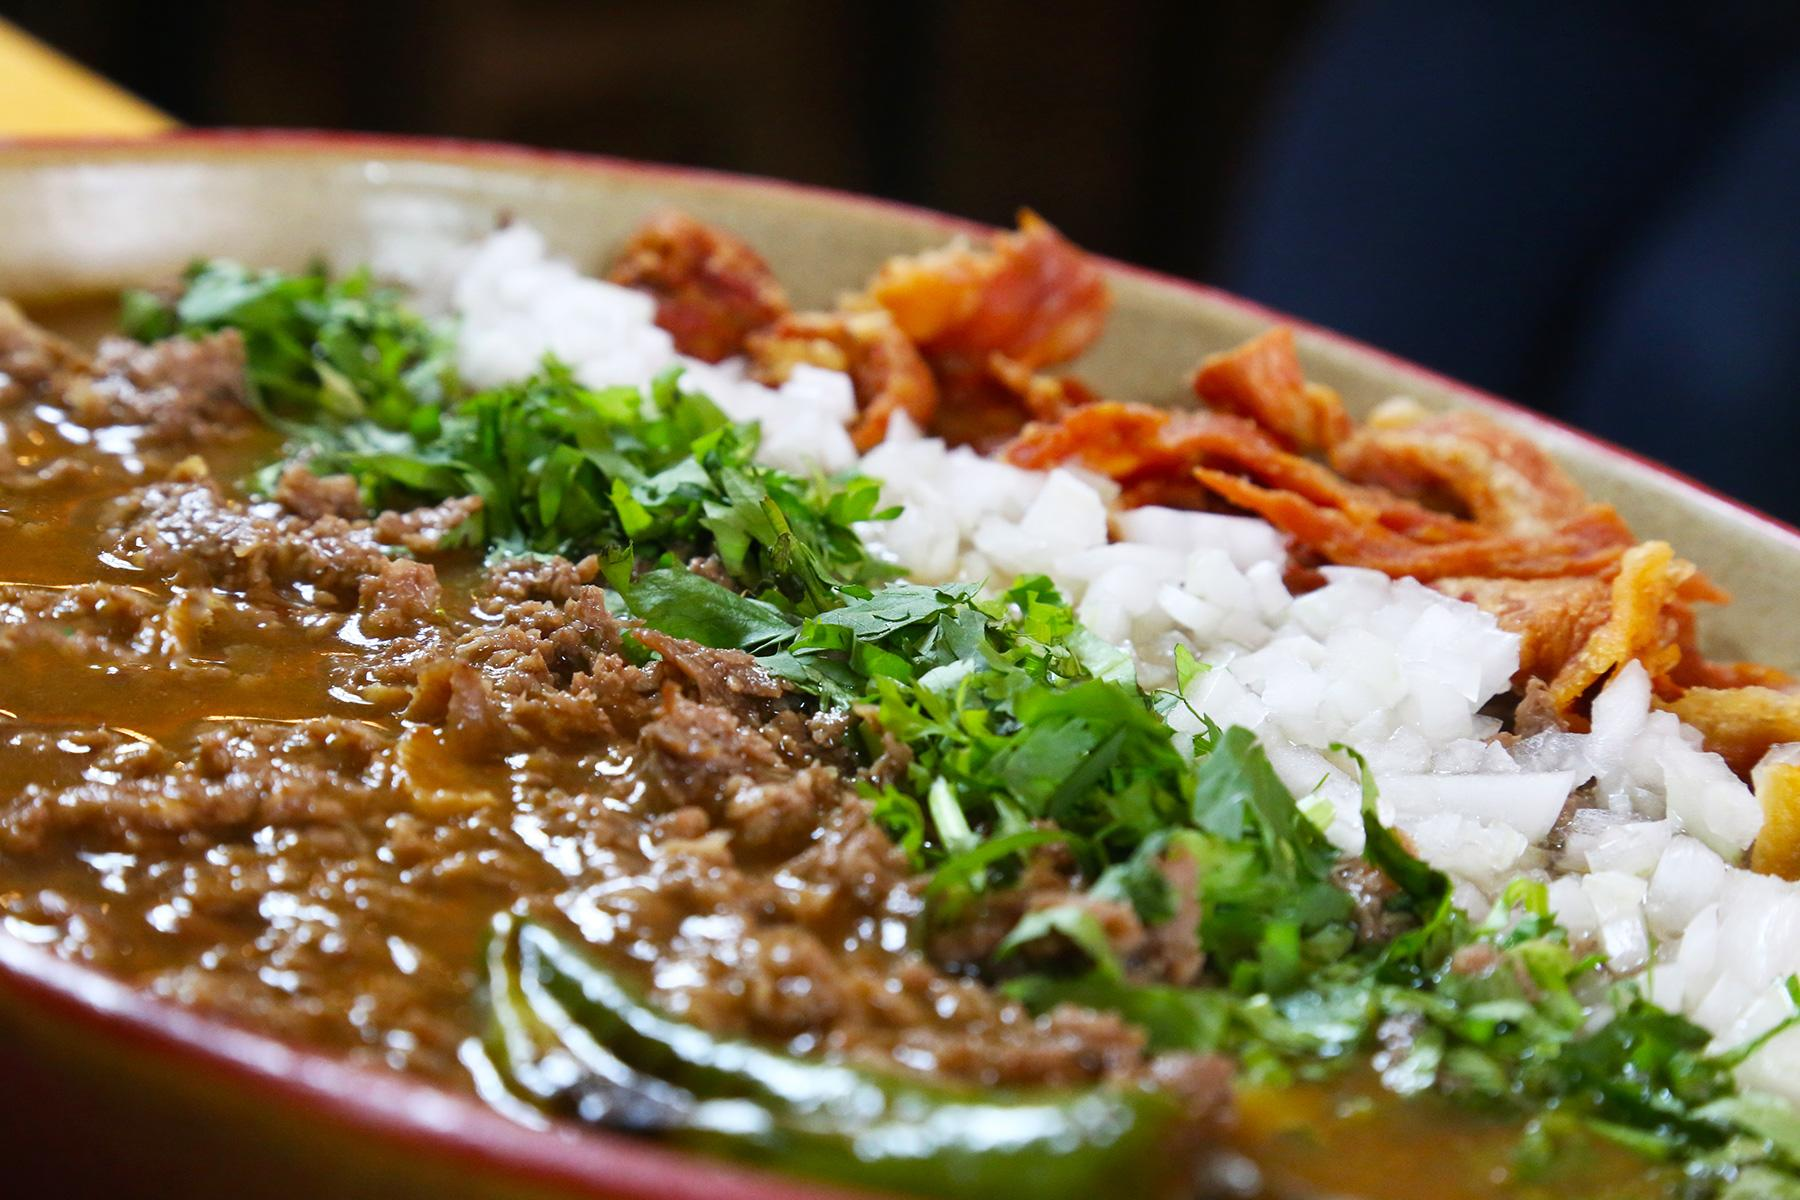 Best Things to Eat in Guadalajara, Mexico